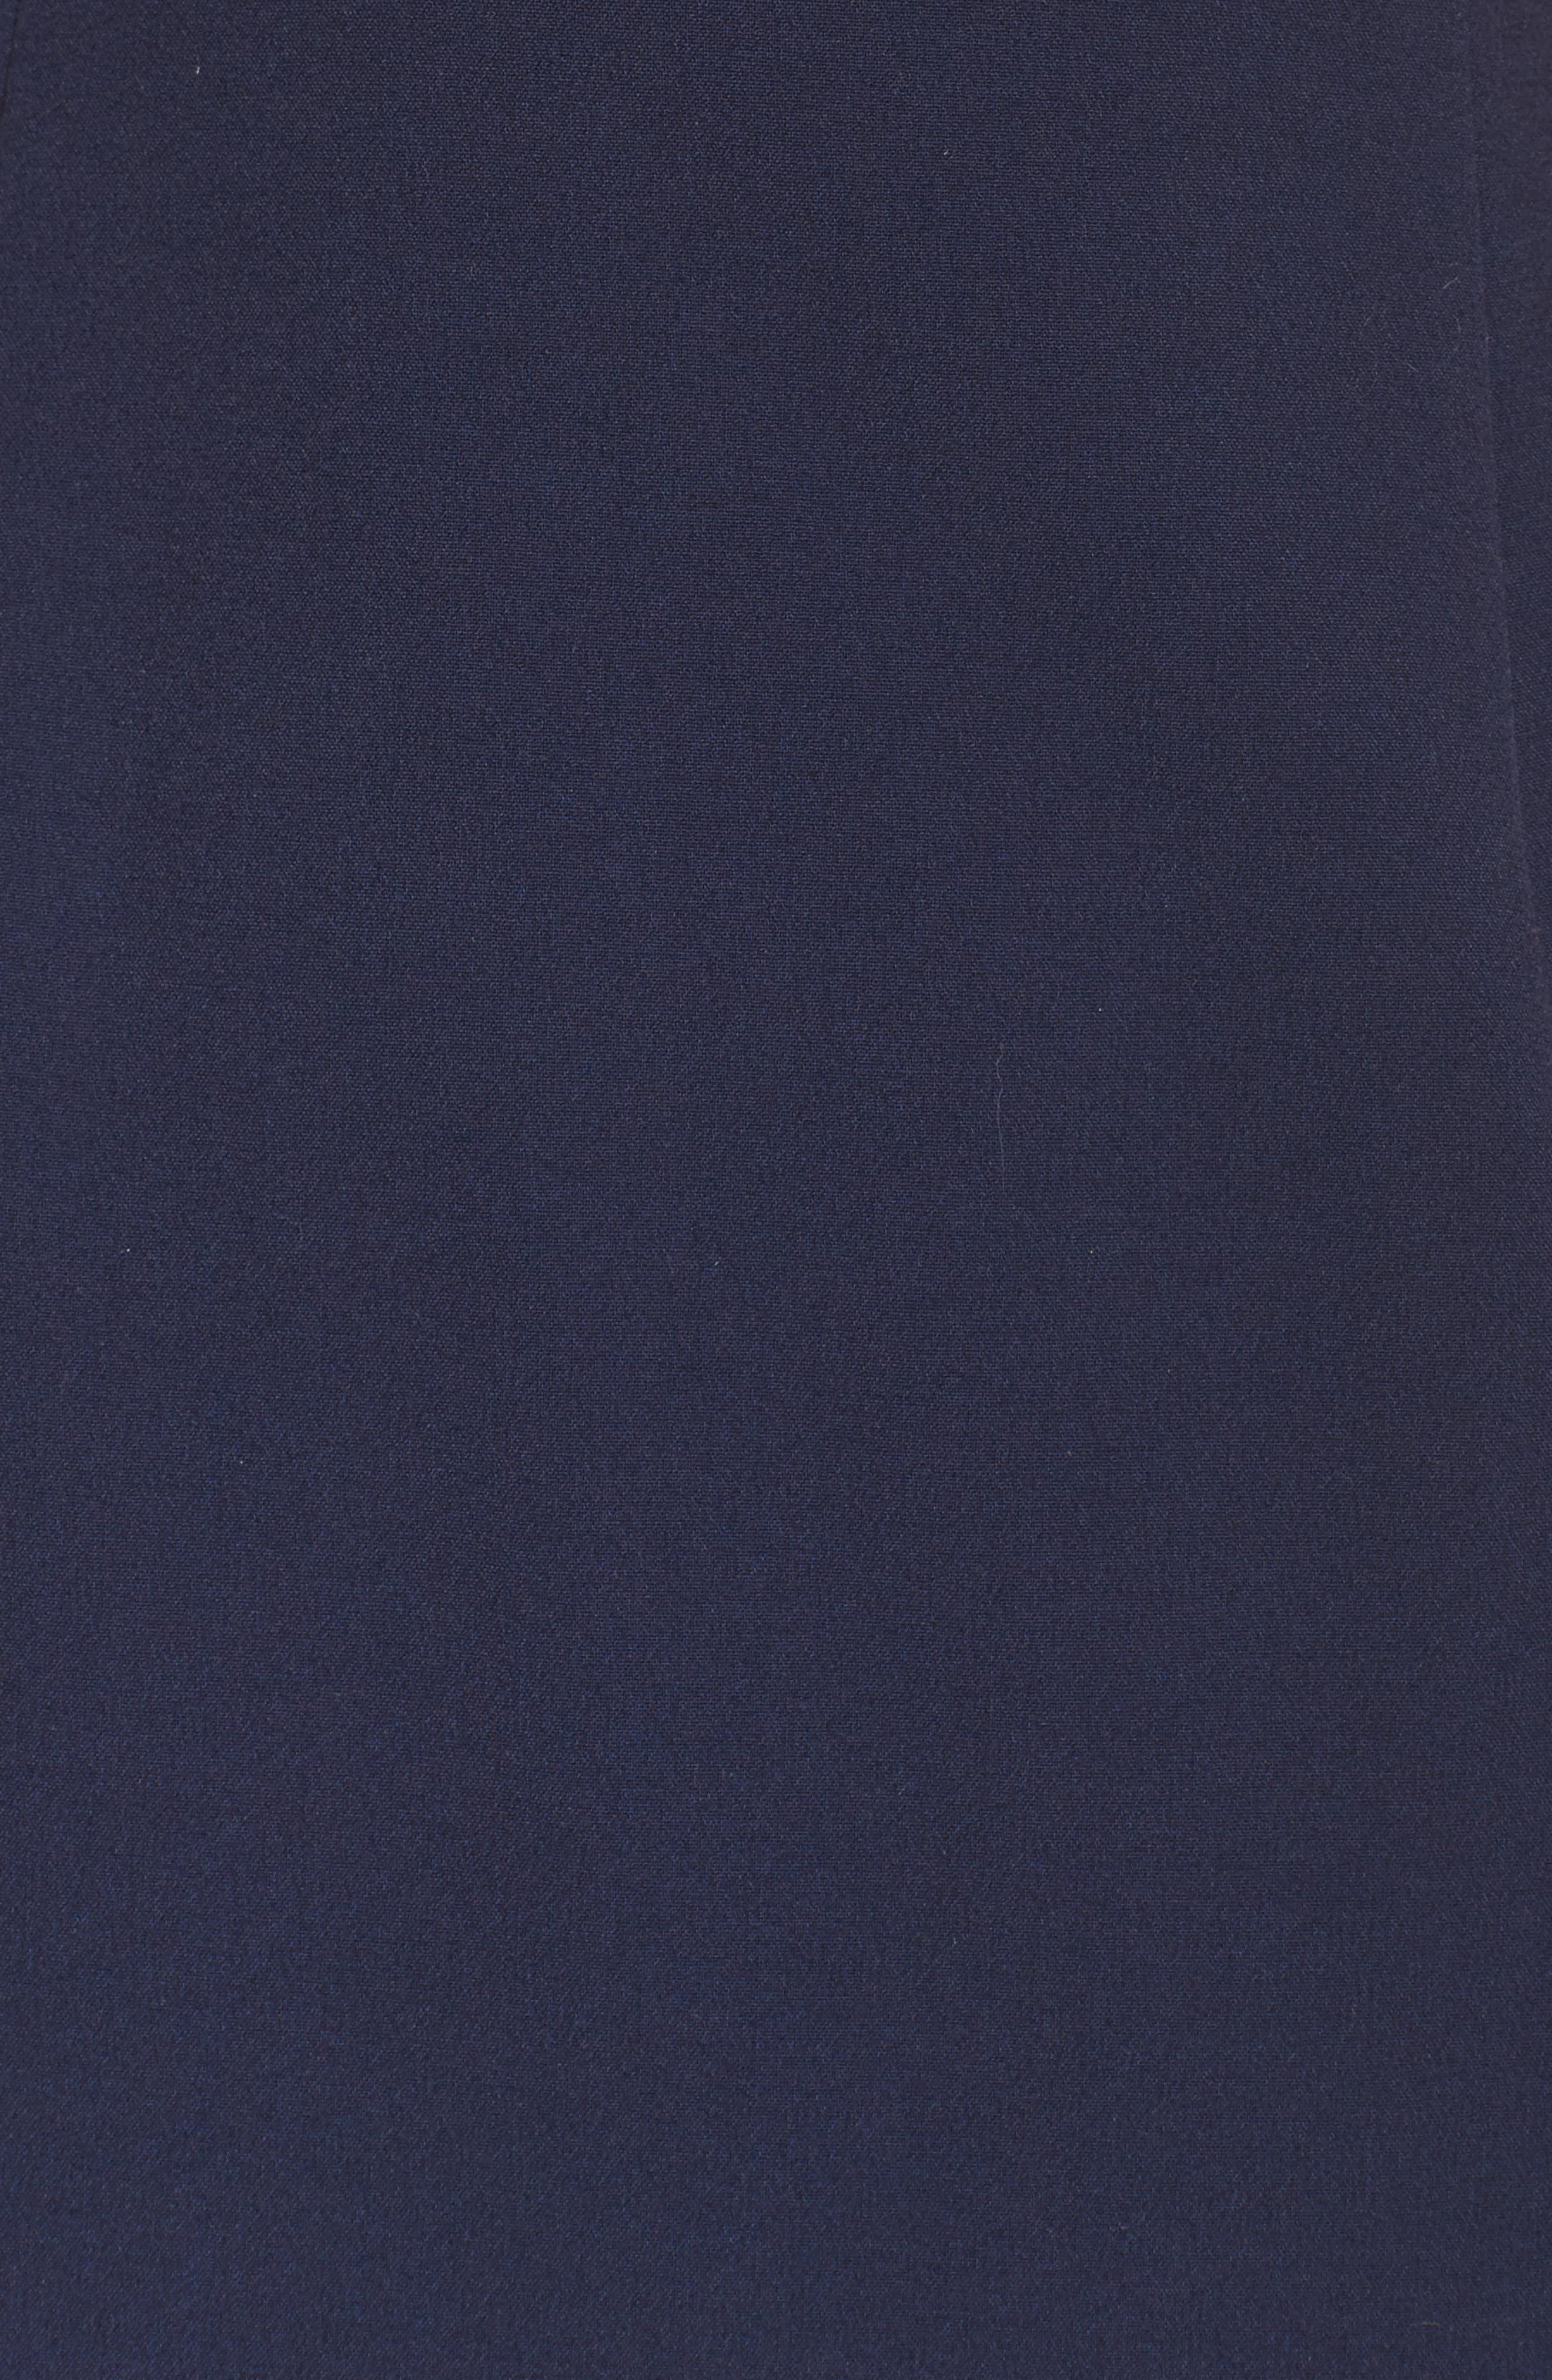 Stretch Sheath Dress,                             Alternate thumbnail 5, color,                             407